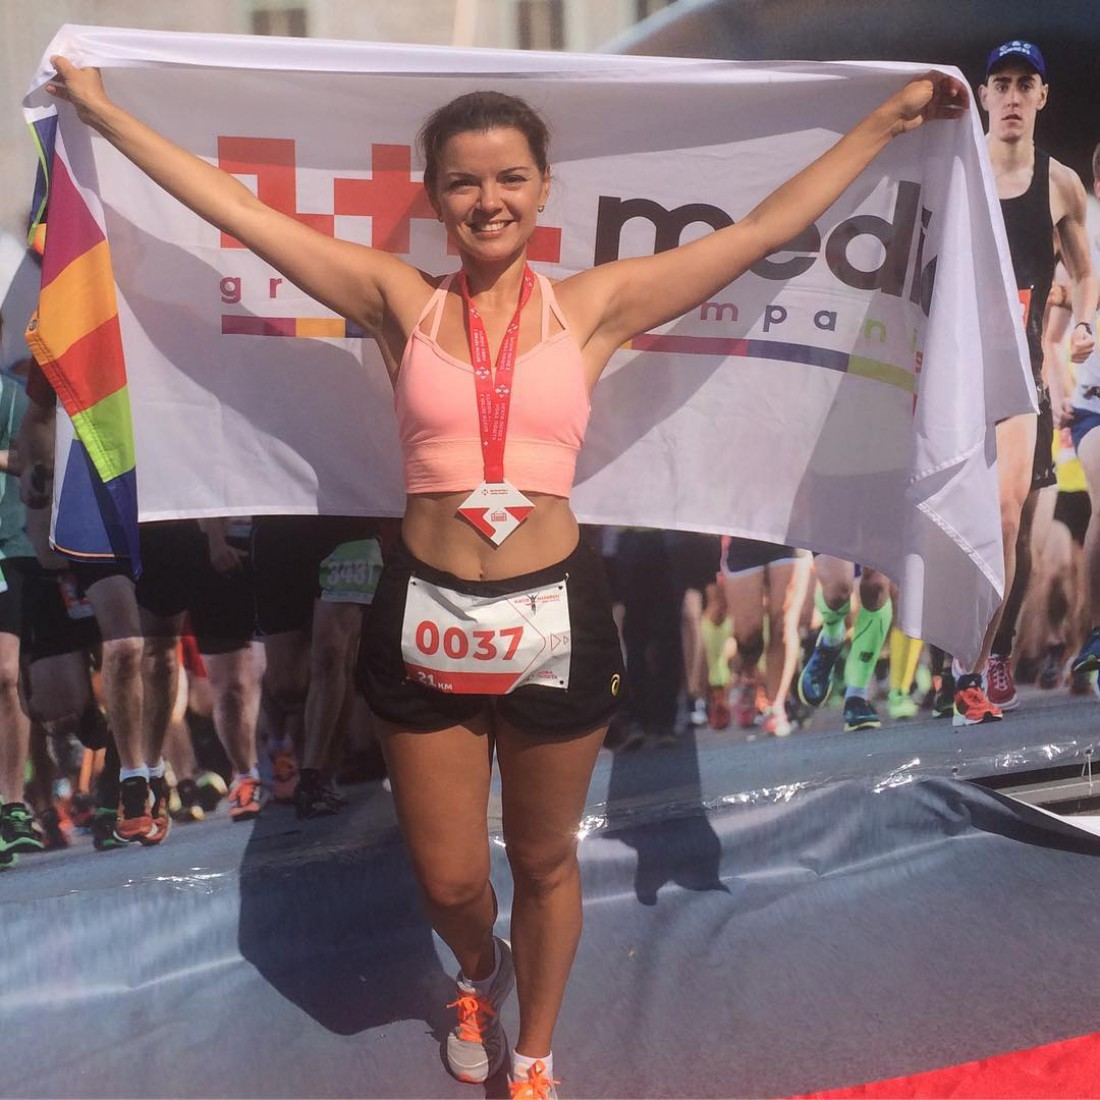 Маричка Падалко активно занимается спортом